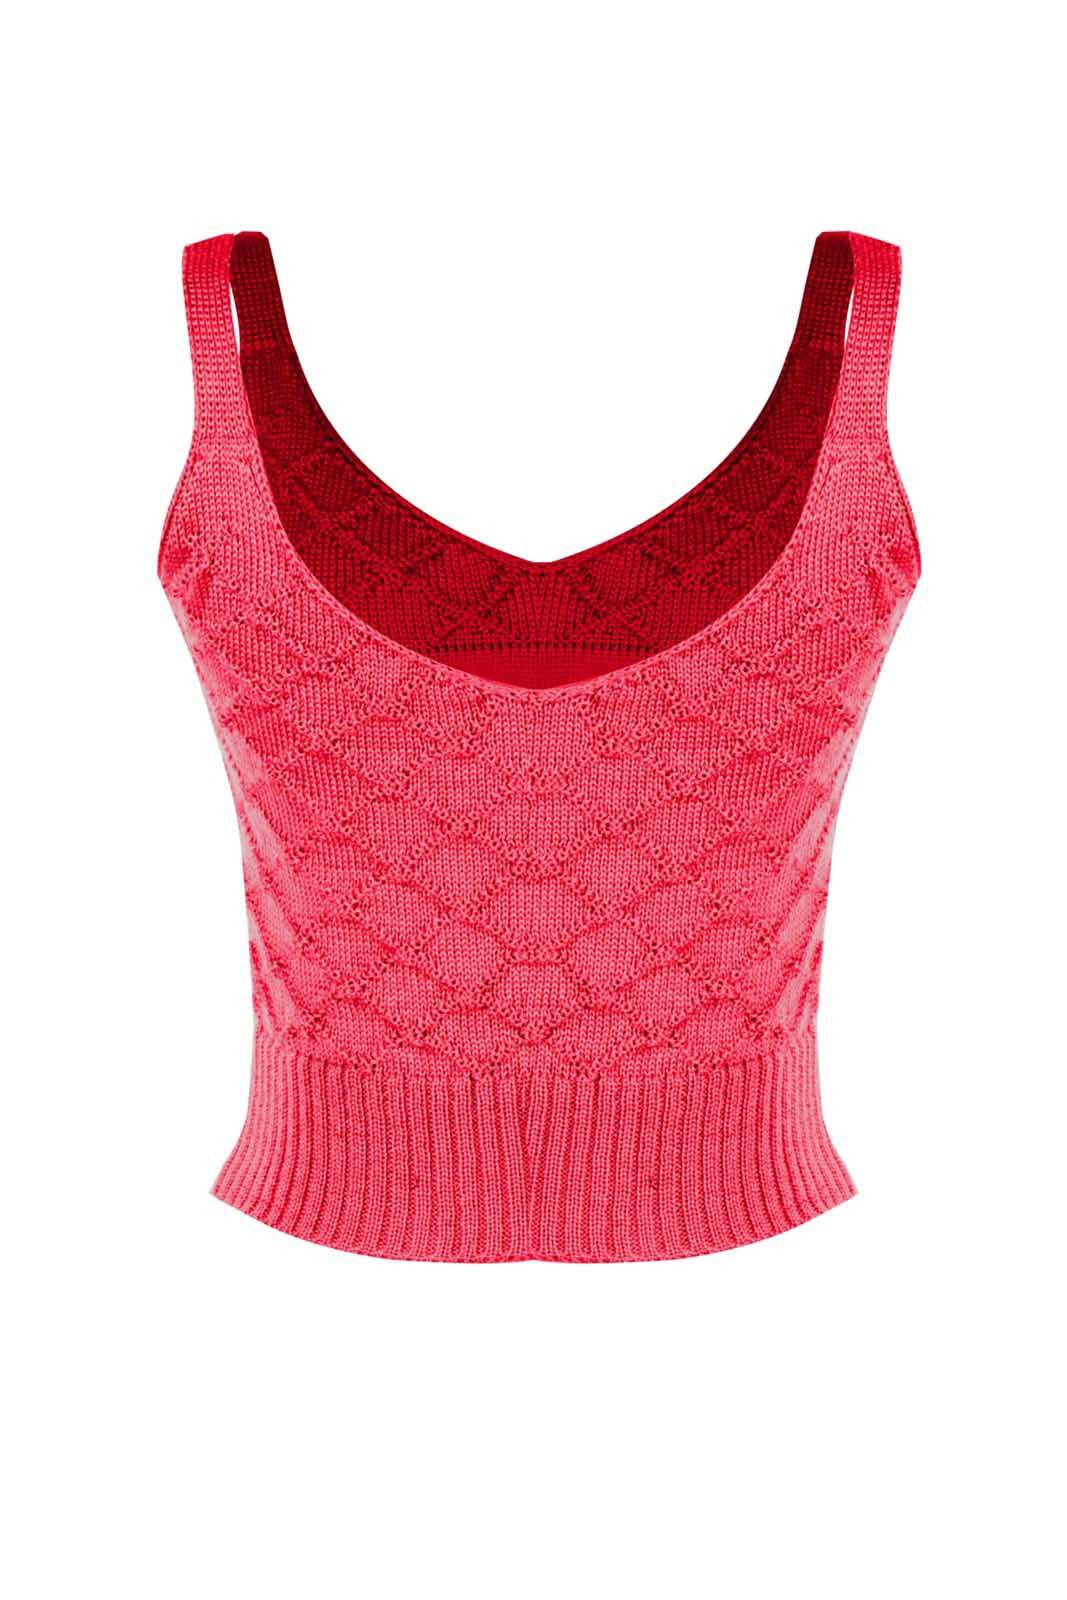 Top Outlet Dri Cropped Tricot Estampado Estampa Segue o Baile Pink